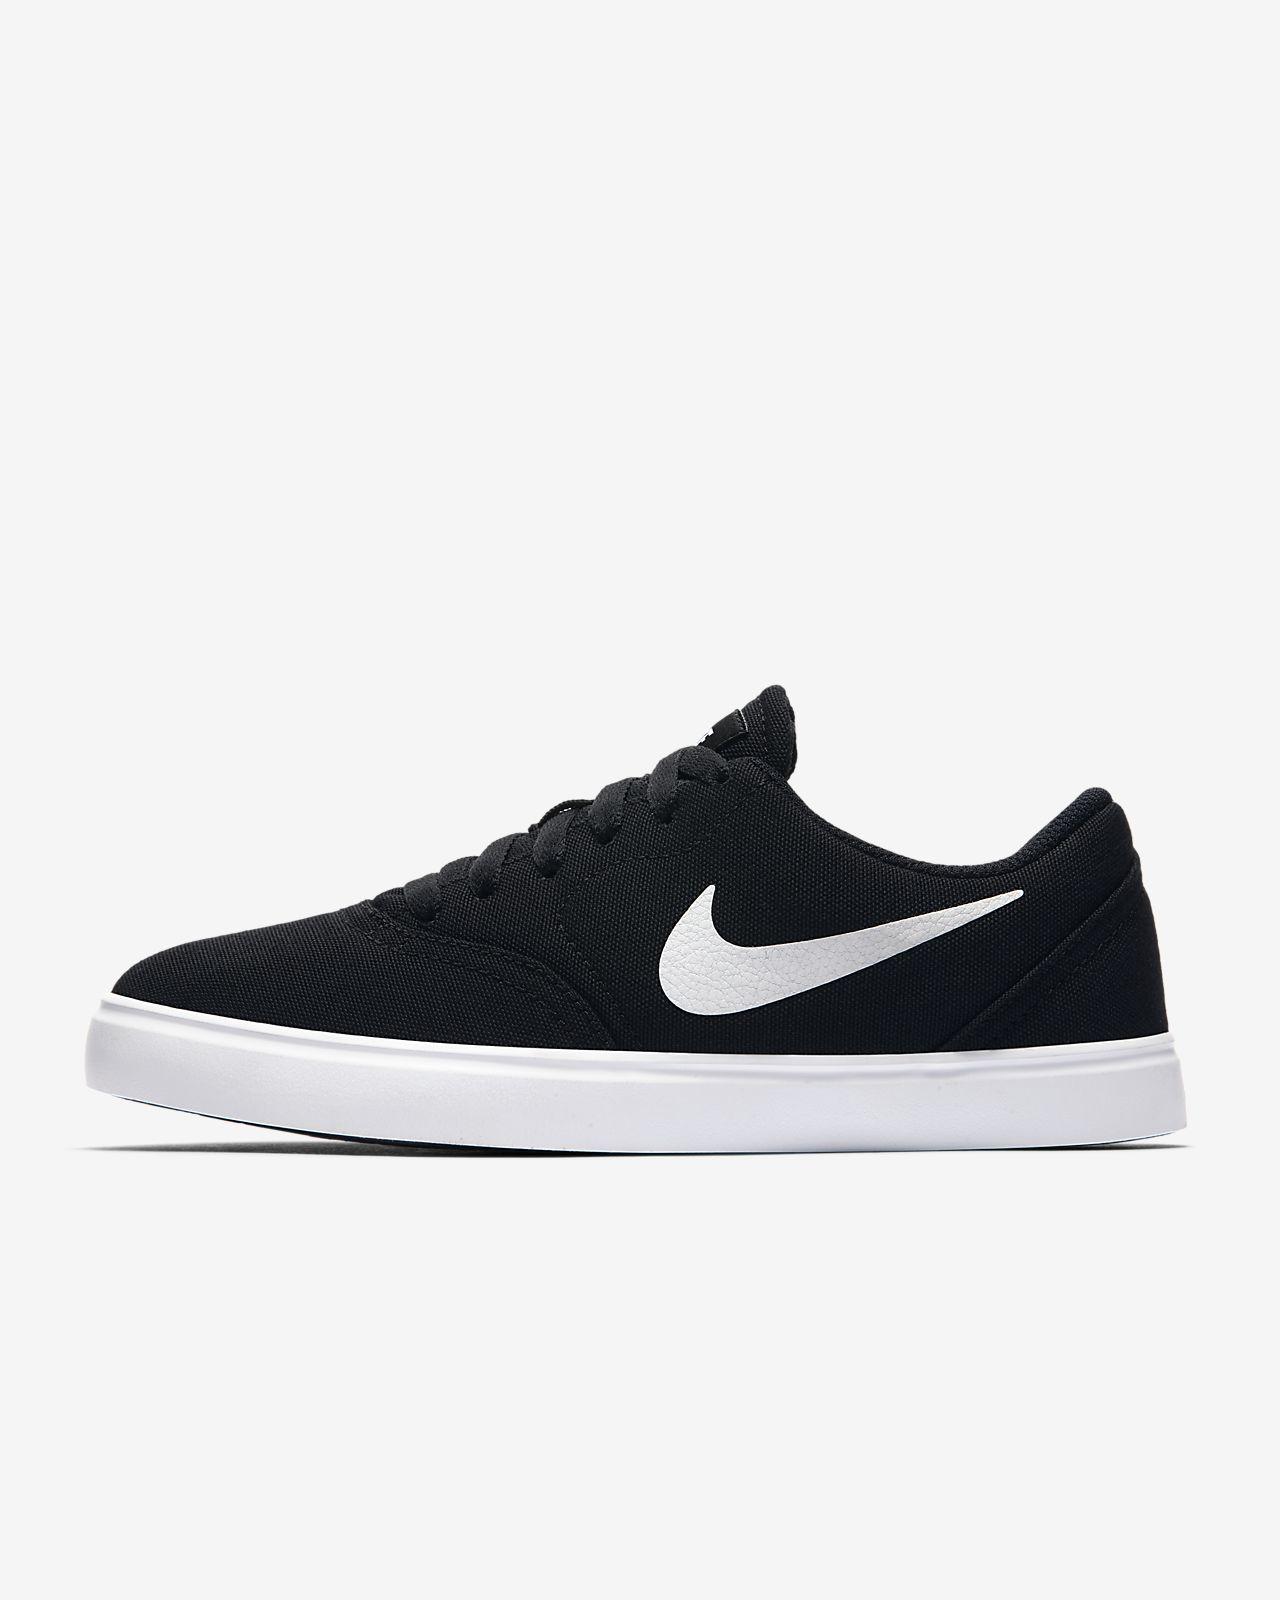 Nike SB Check Canvas Skateboardschuh für ältere Kinder